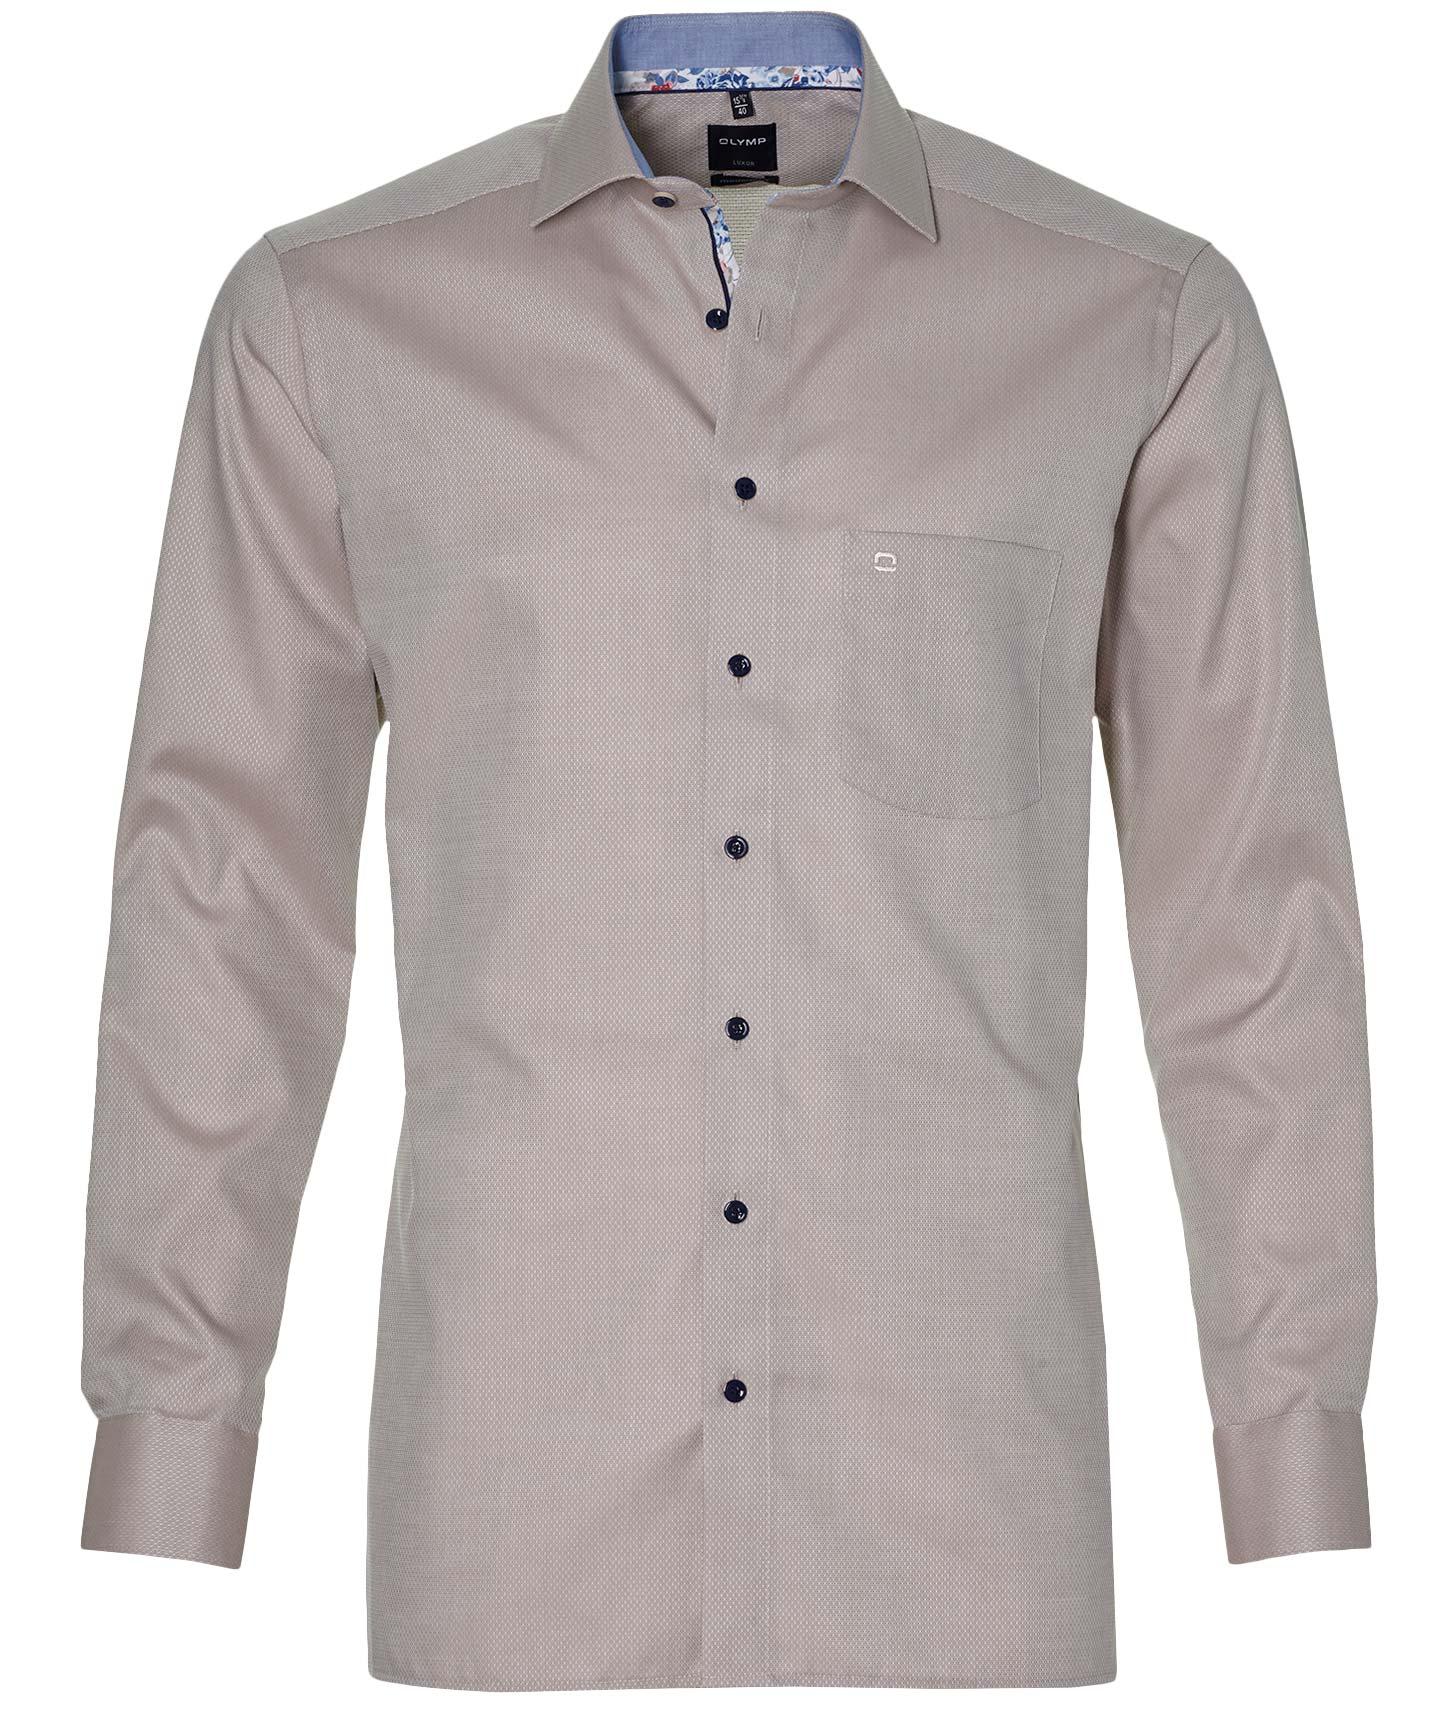 Olymp Overhemd - Modern Fit - Beige